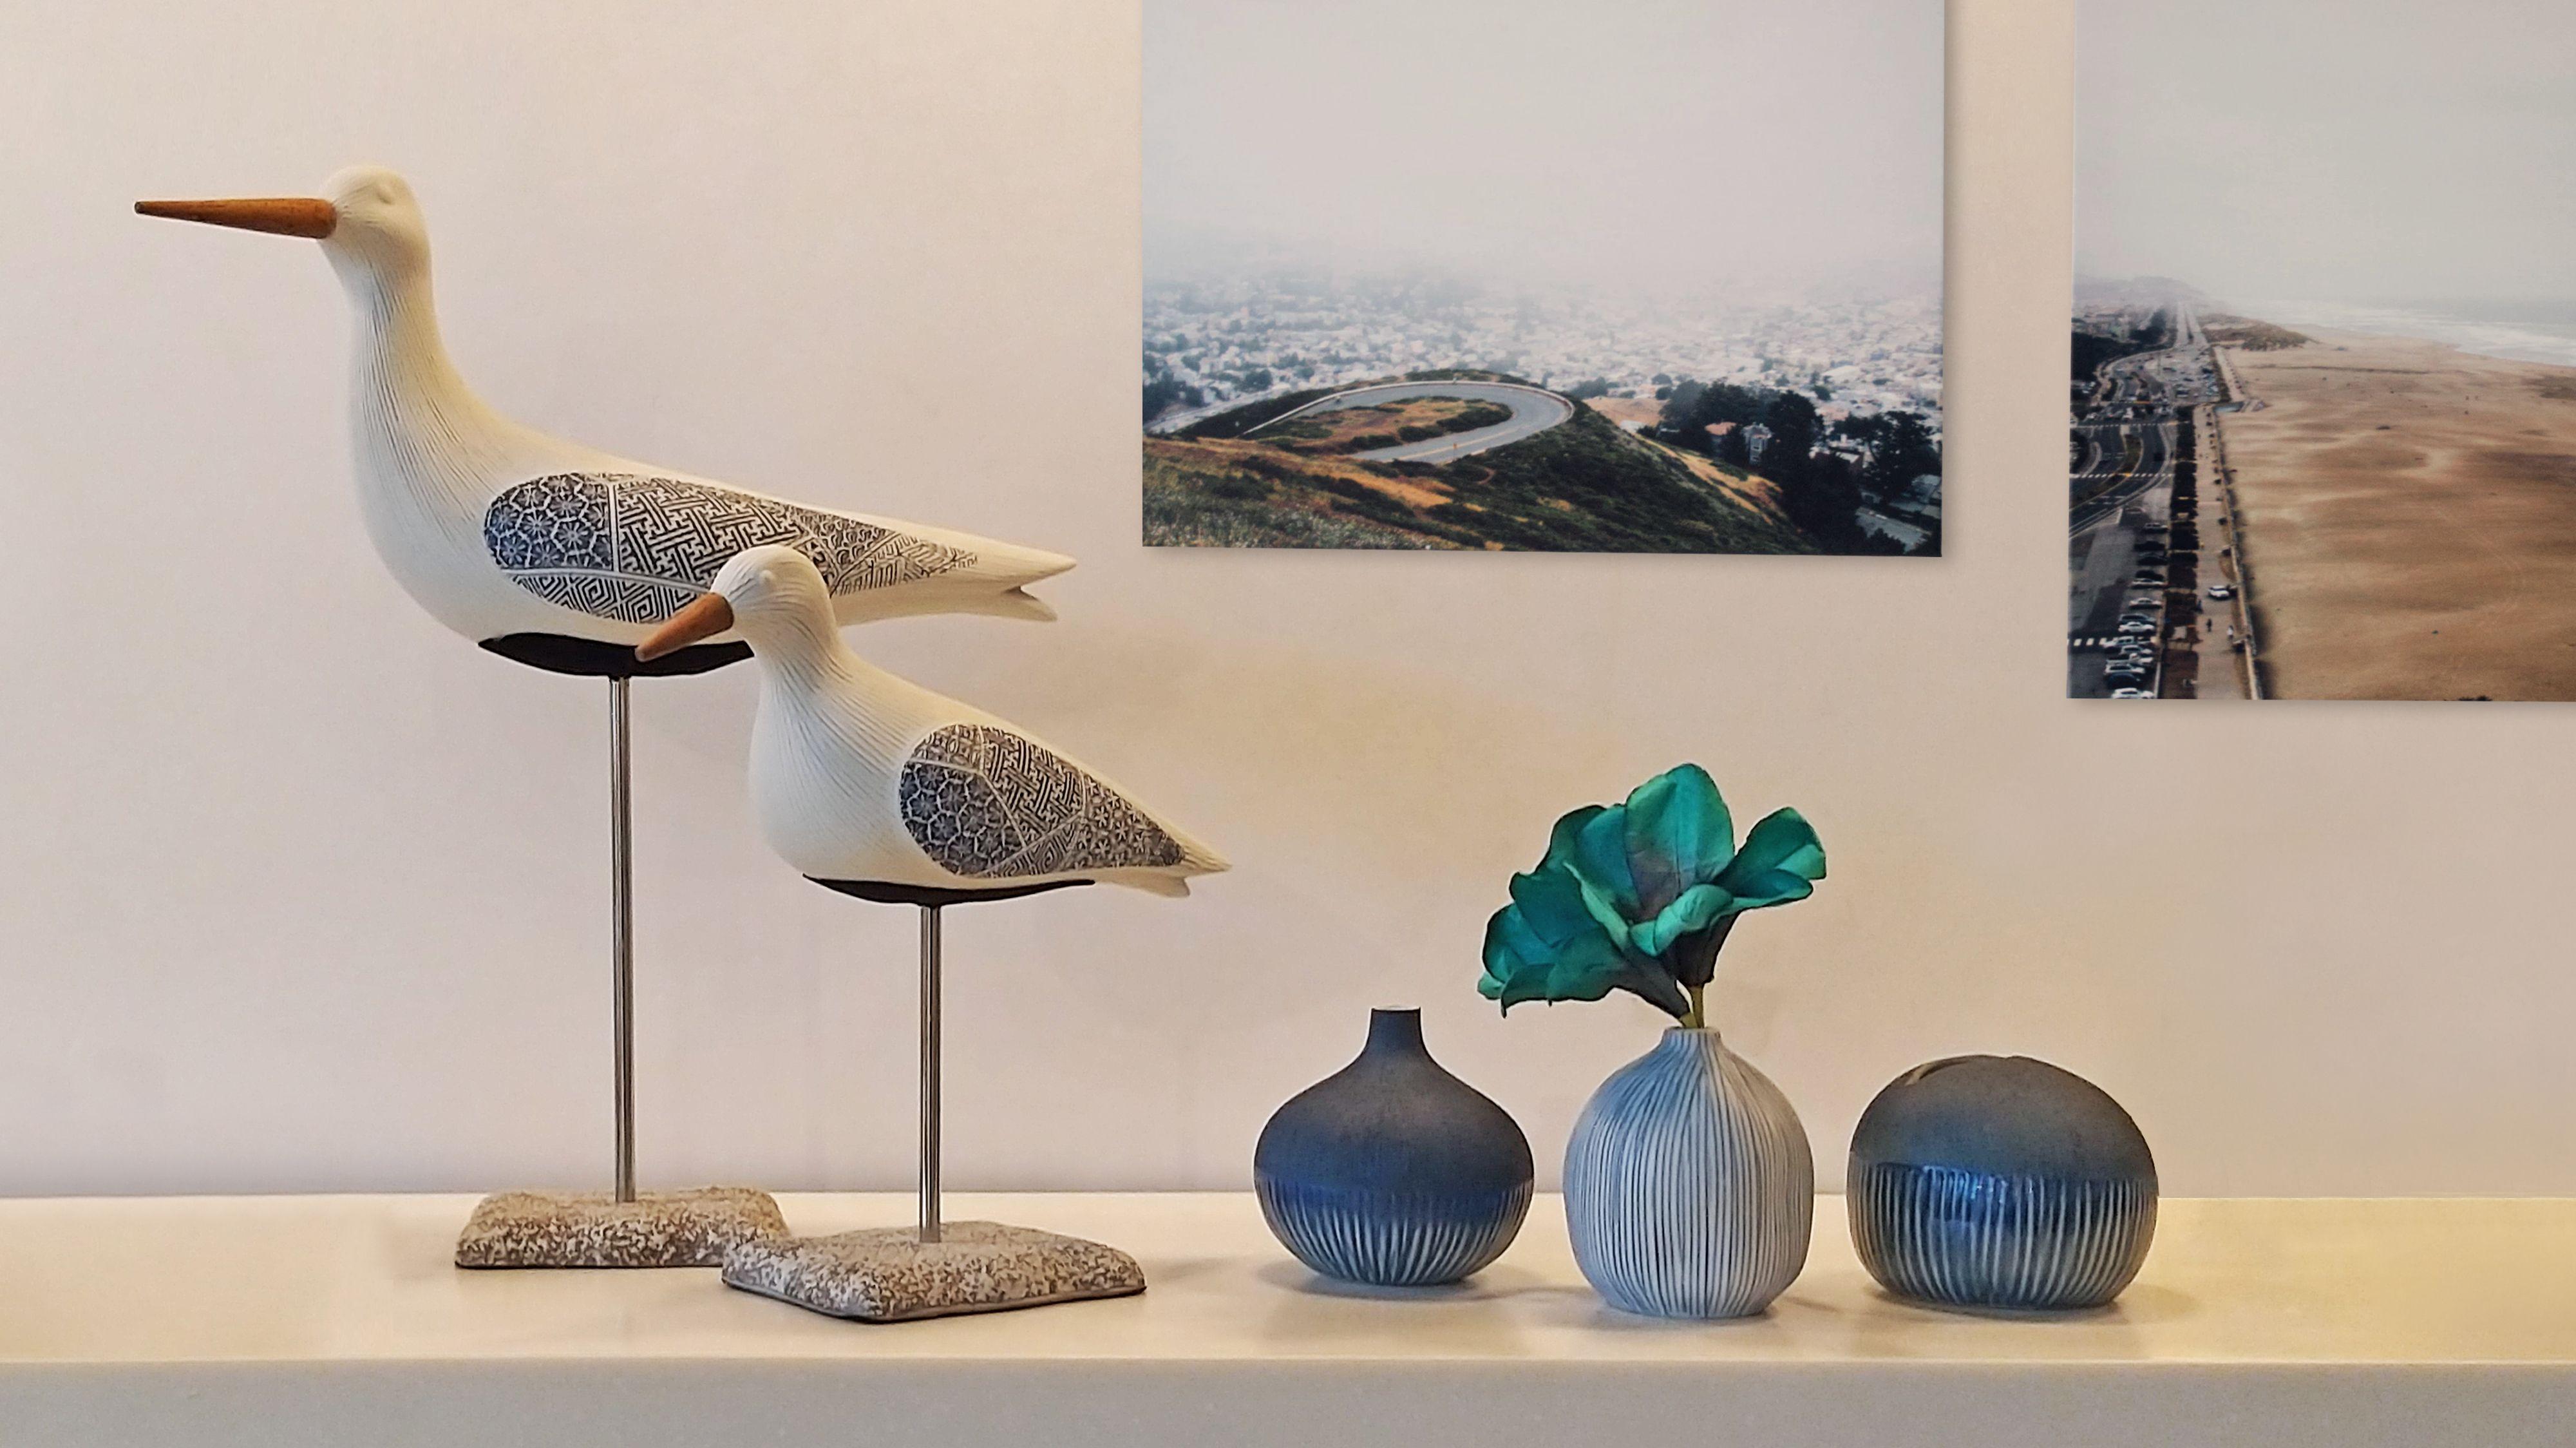 Ceramic bird figurines and mini vase set home accessories perfect for minimalist house interior.